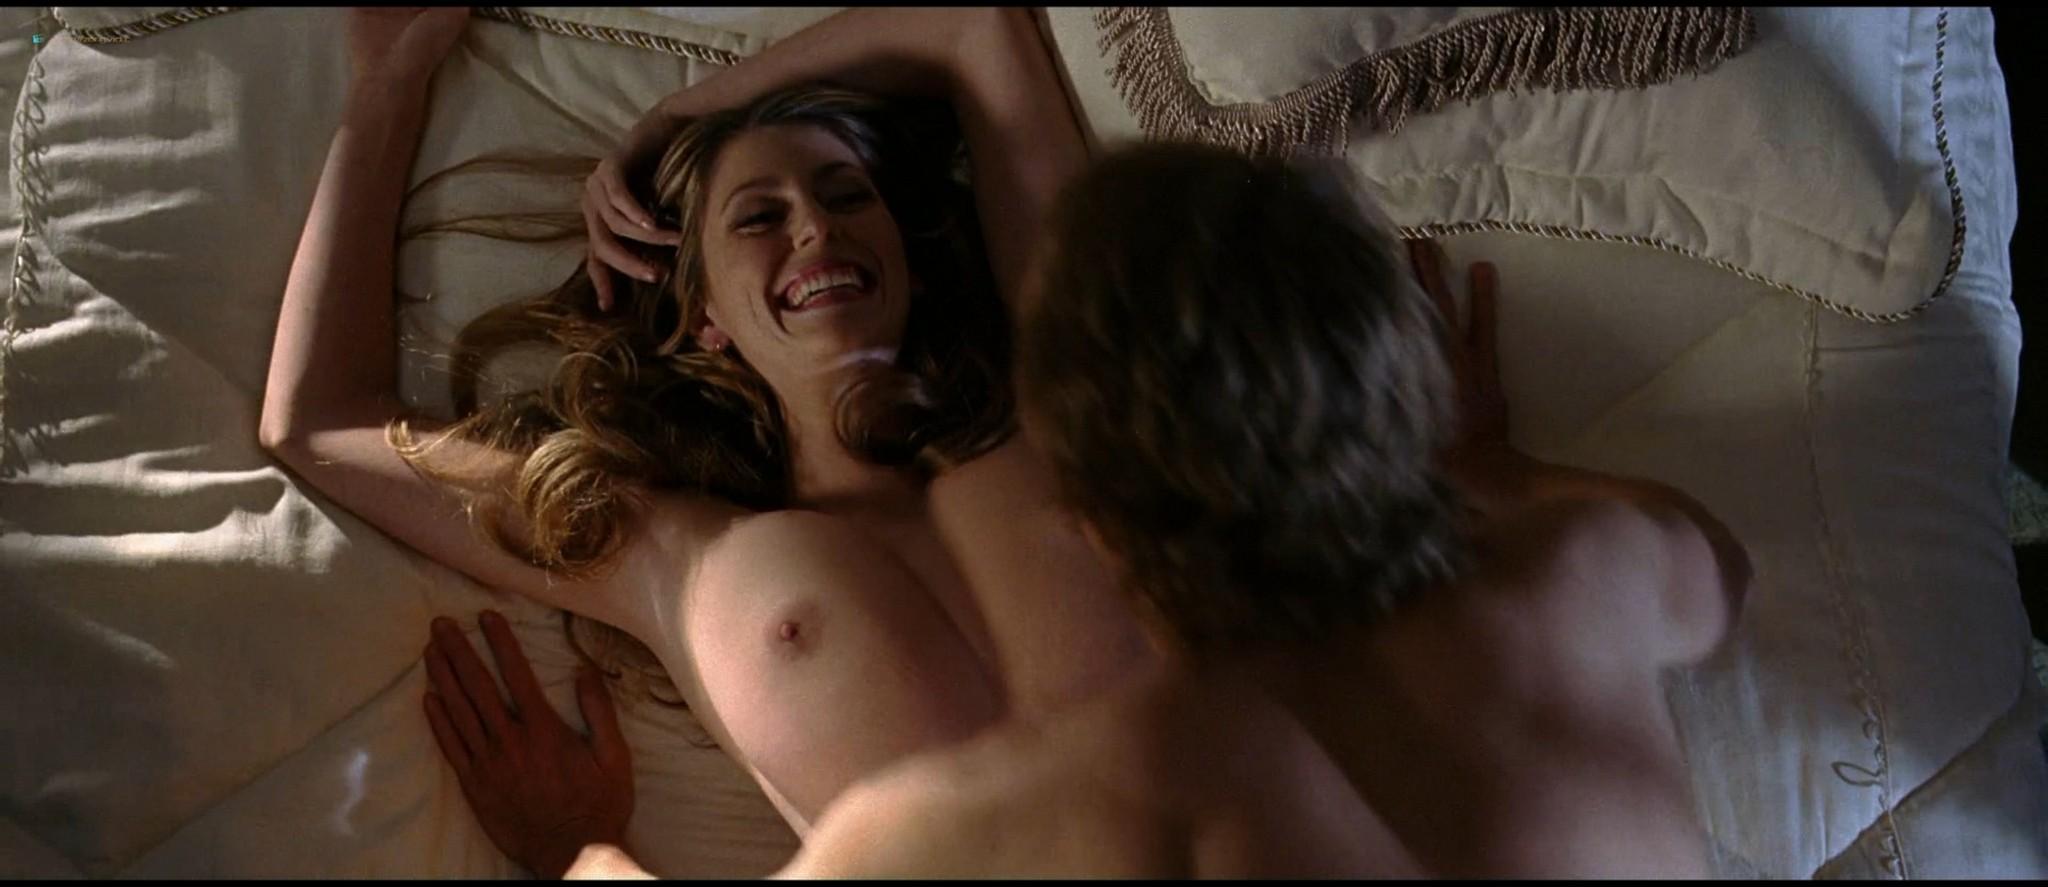 Diora Baird nude topless huge boobs others nude too - Wedding Crashers (2005) HD 1080p BluRay (5)